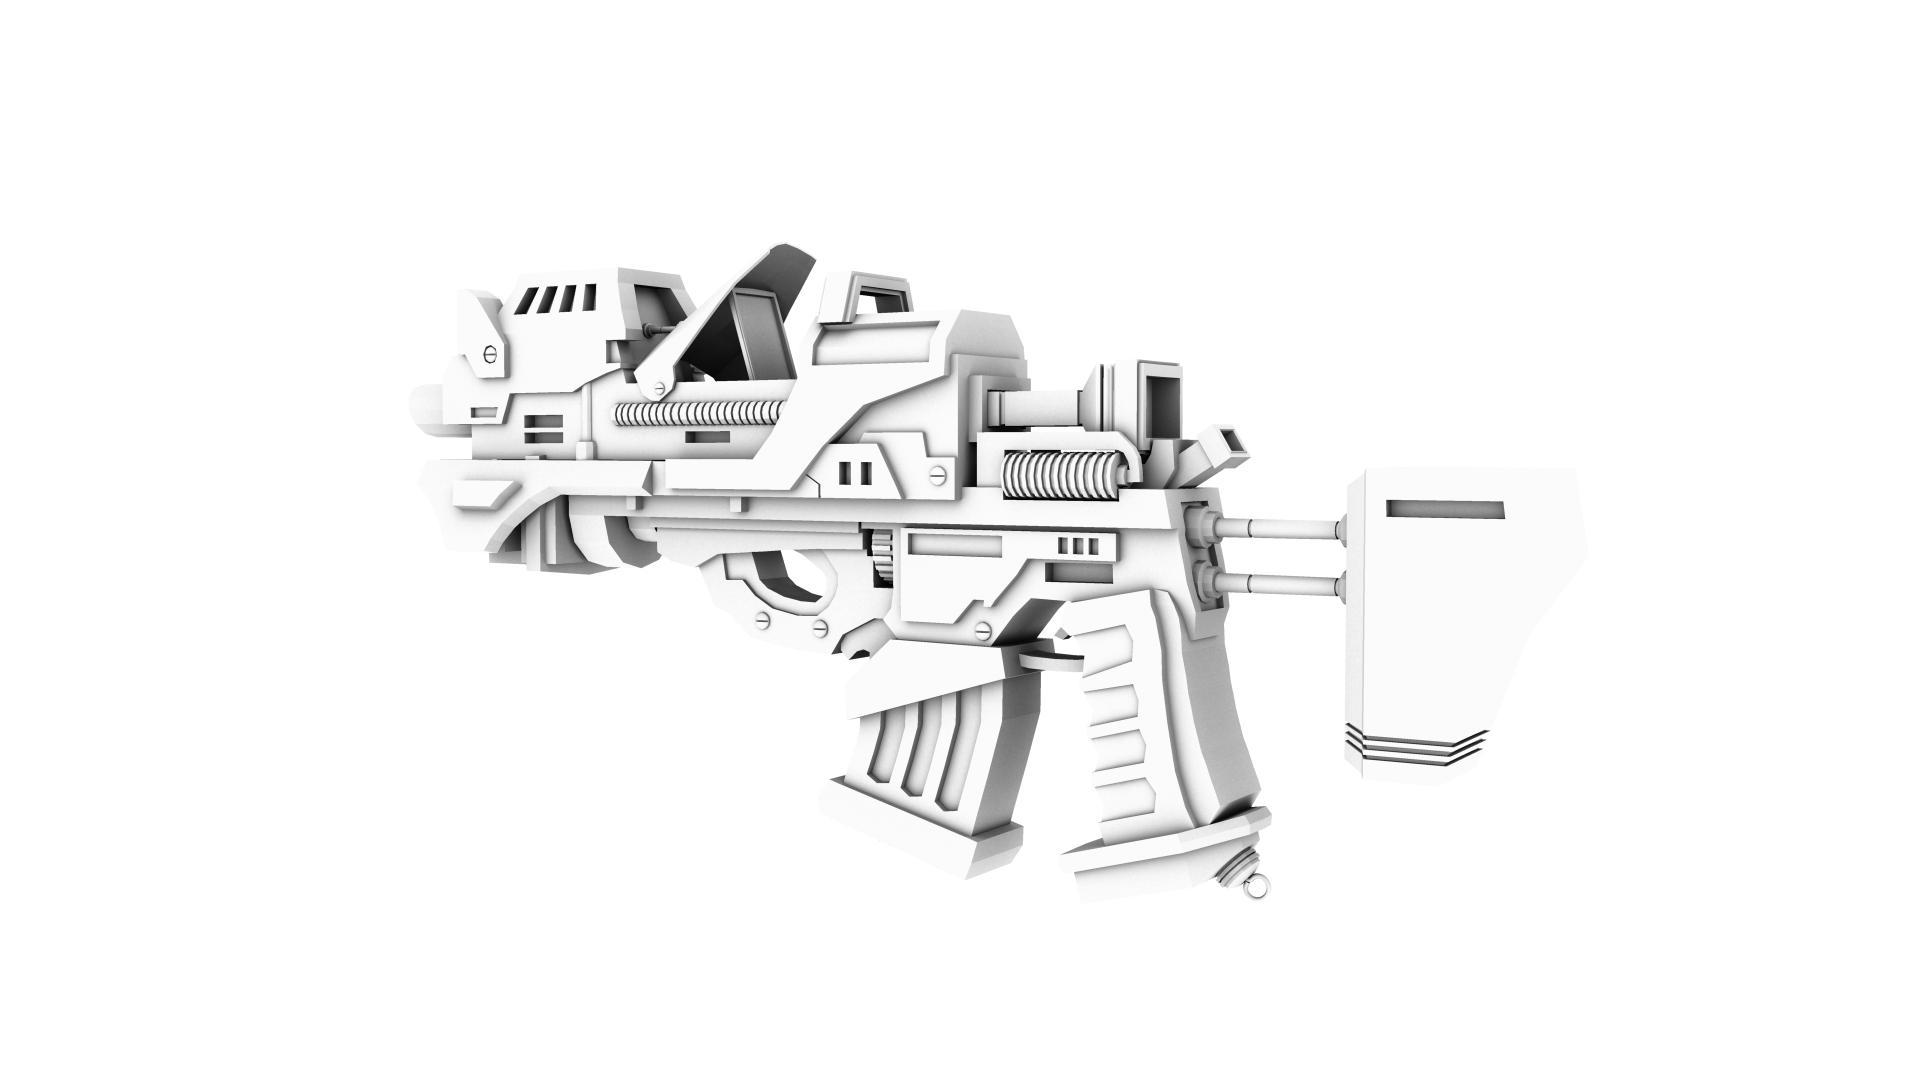 army gun 3d model 128981